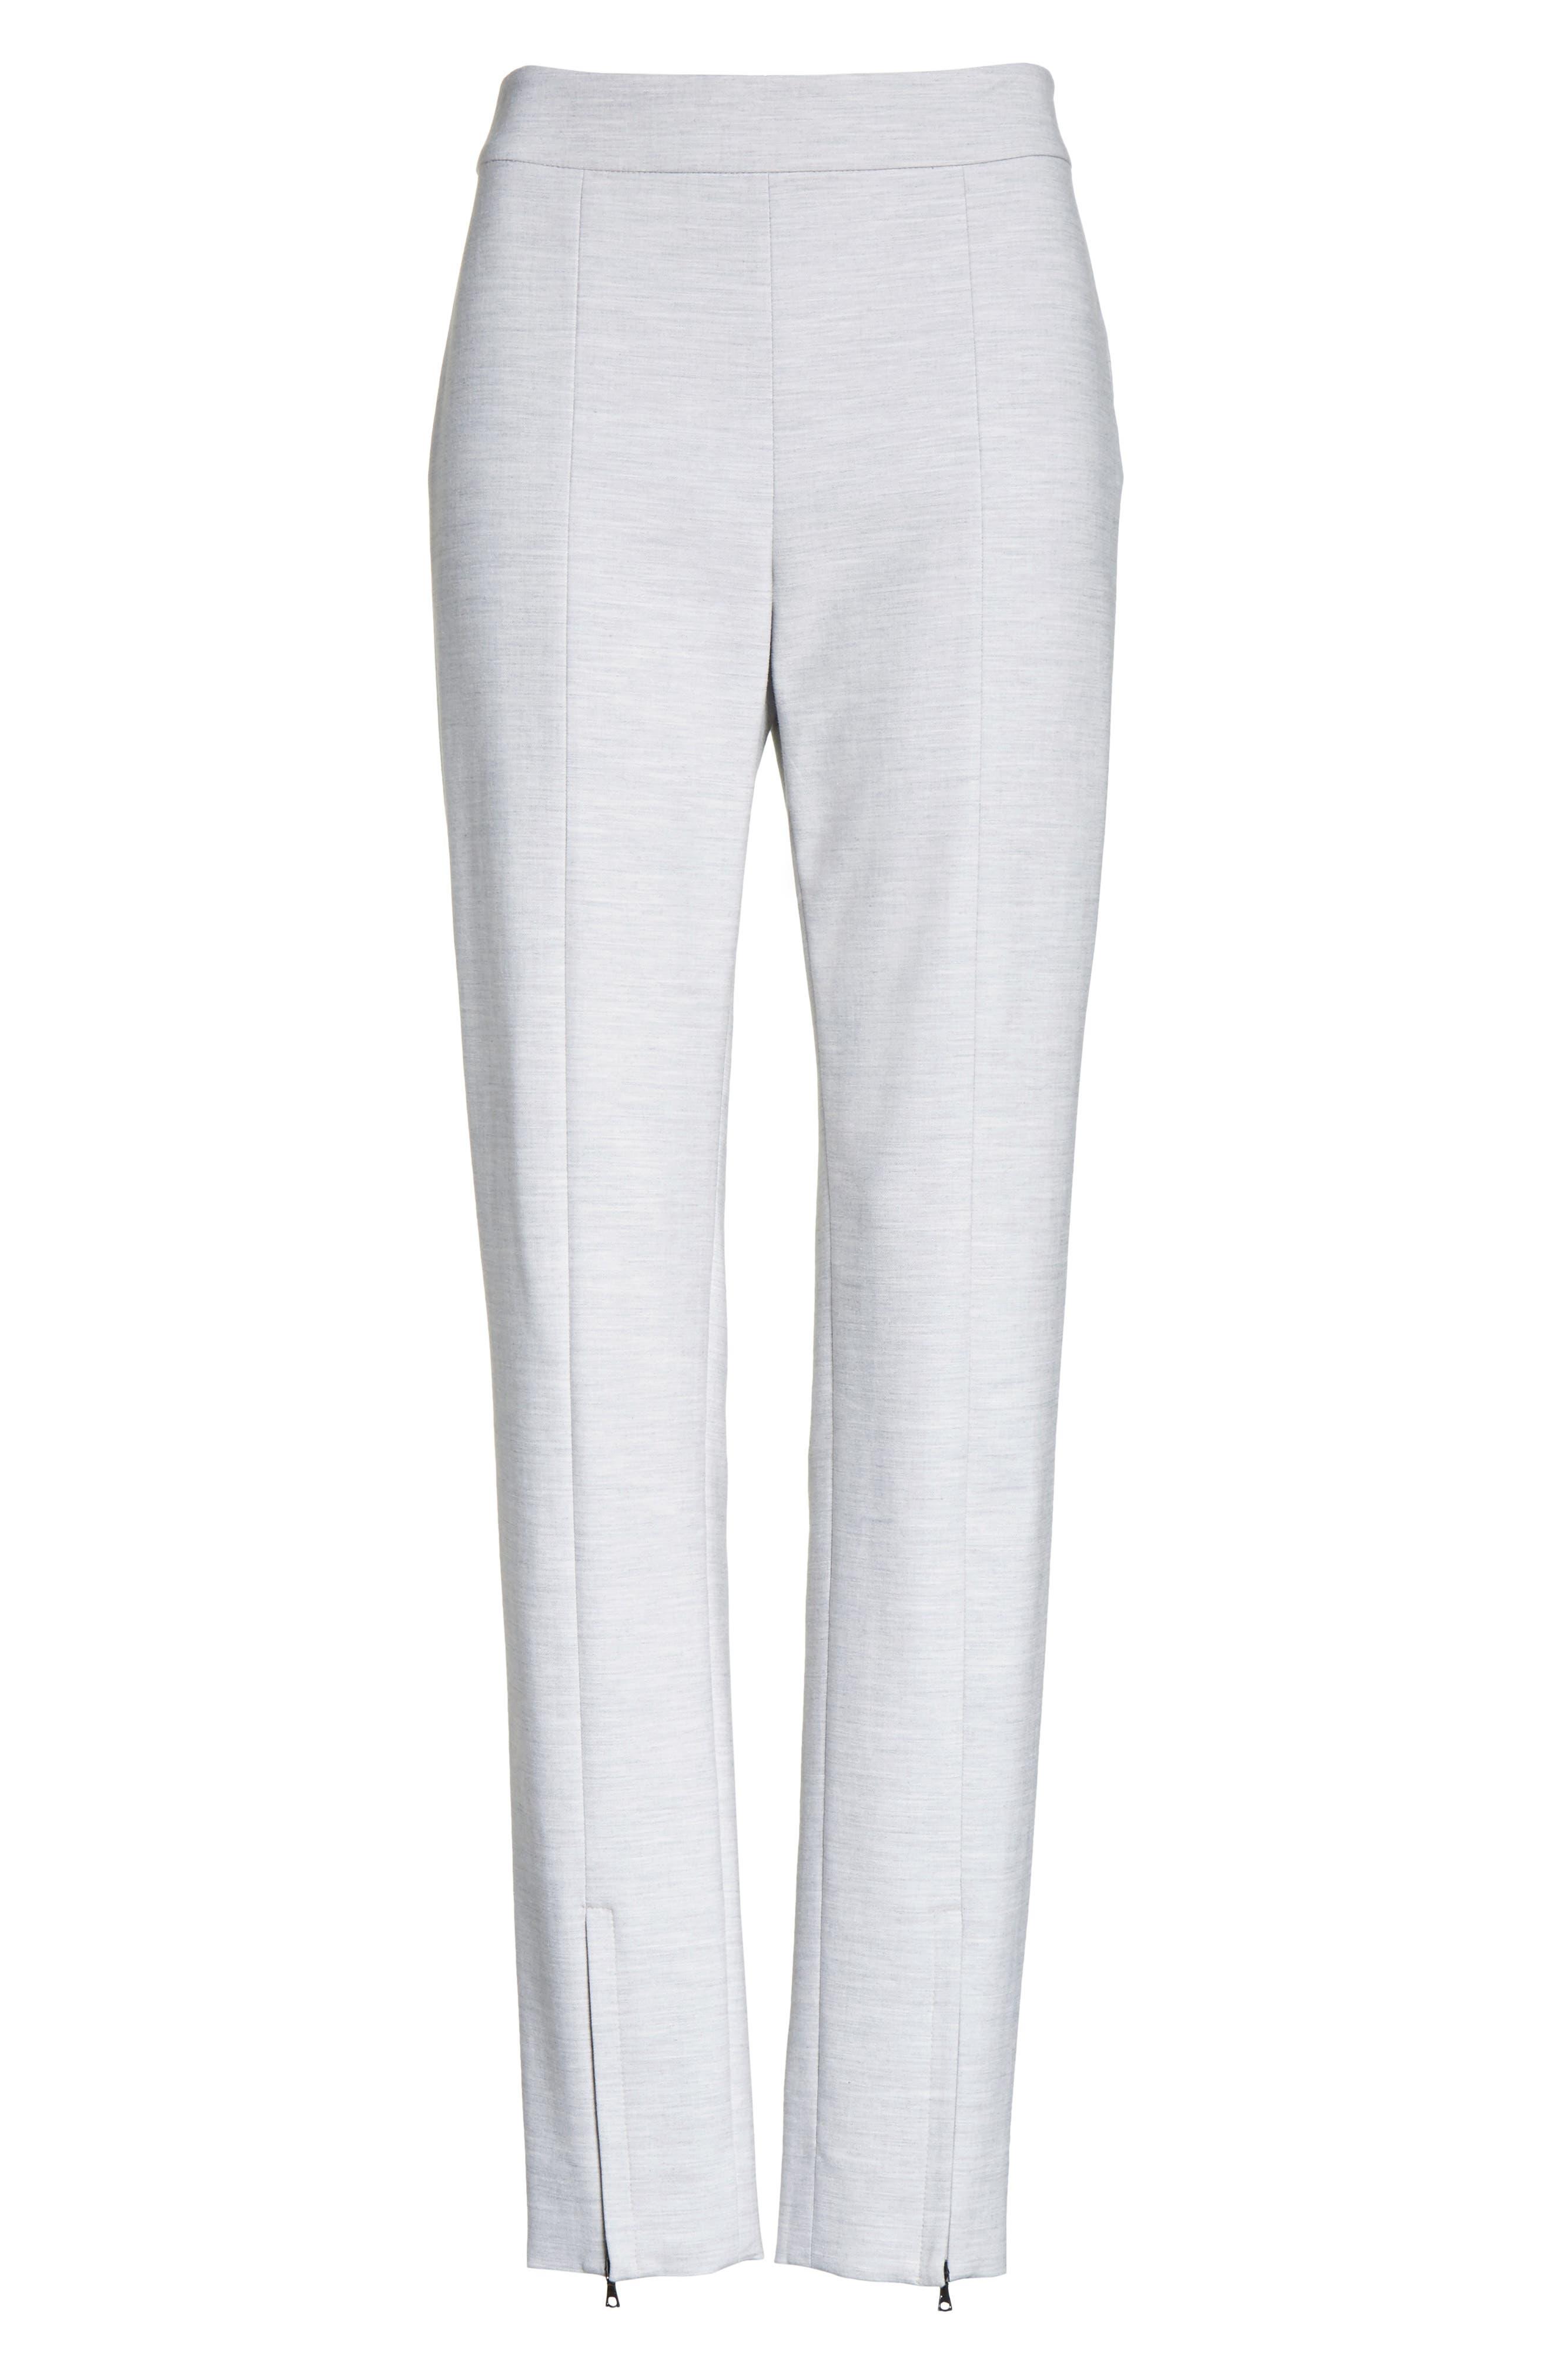 Summer Bella Double Weave Pants,                             Alternate thumbnail 11, color,                             Light Grey Melange